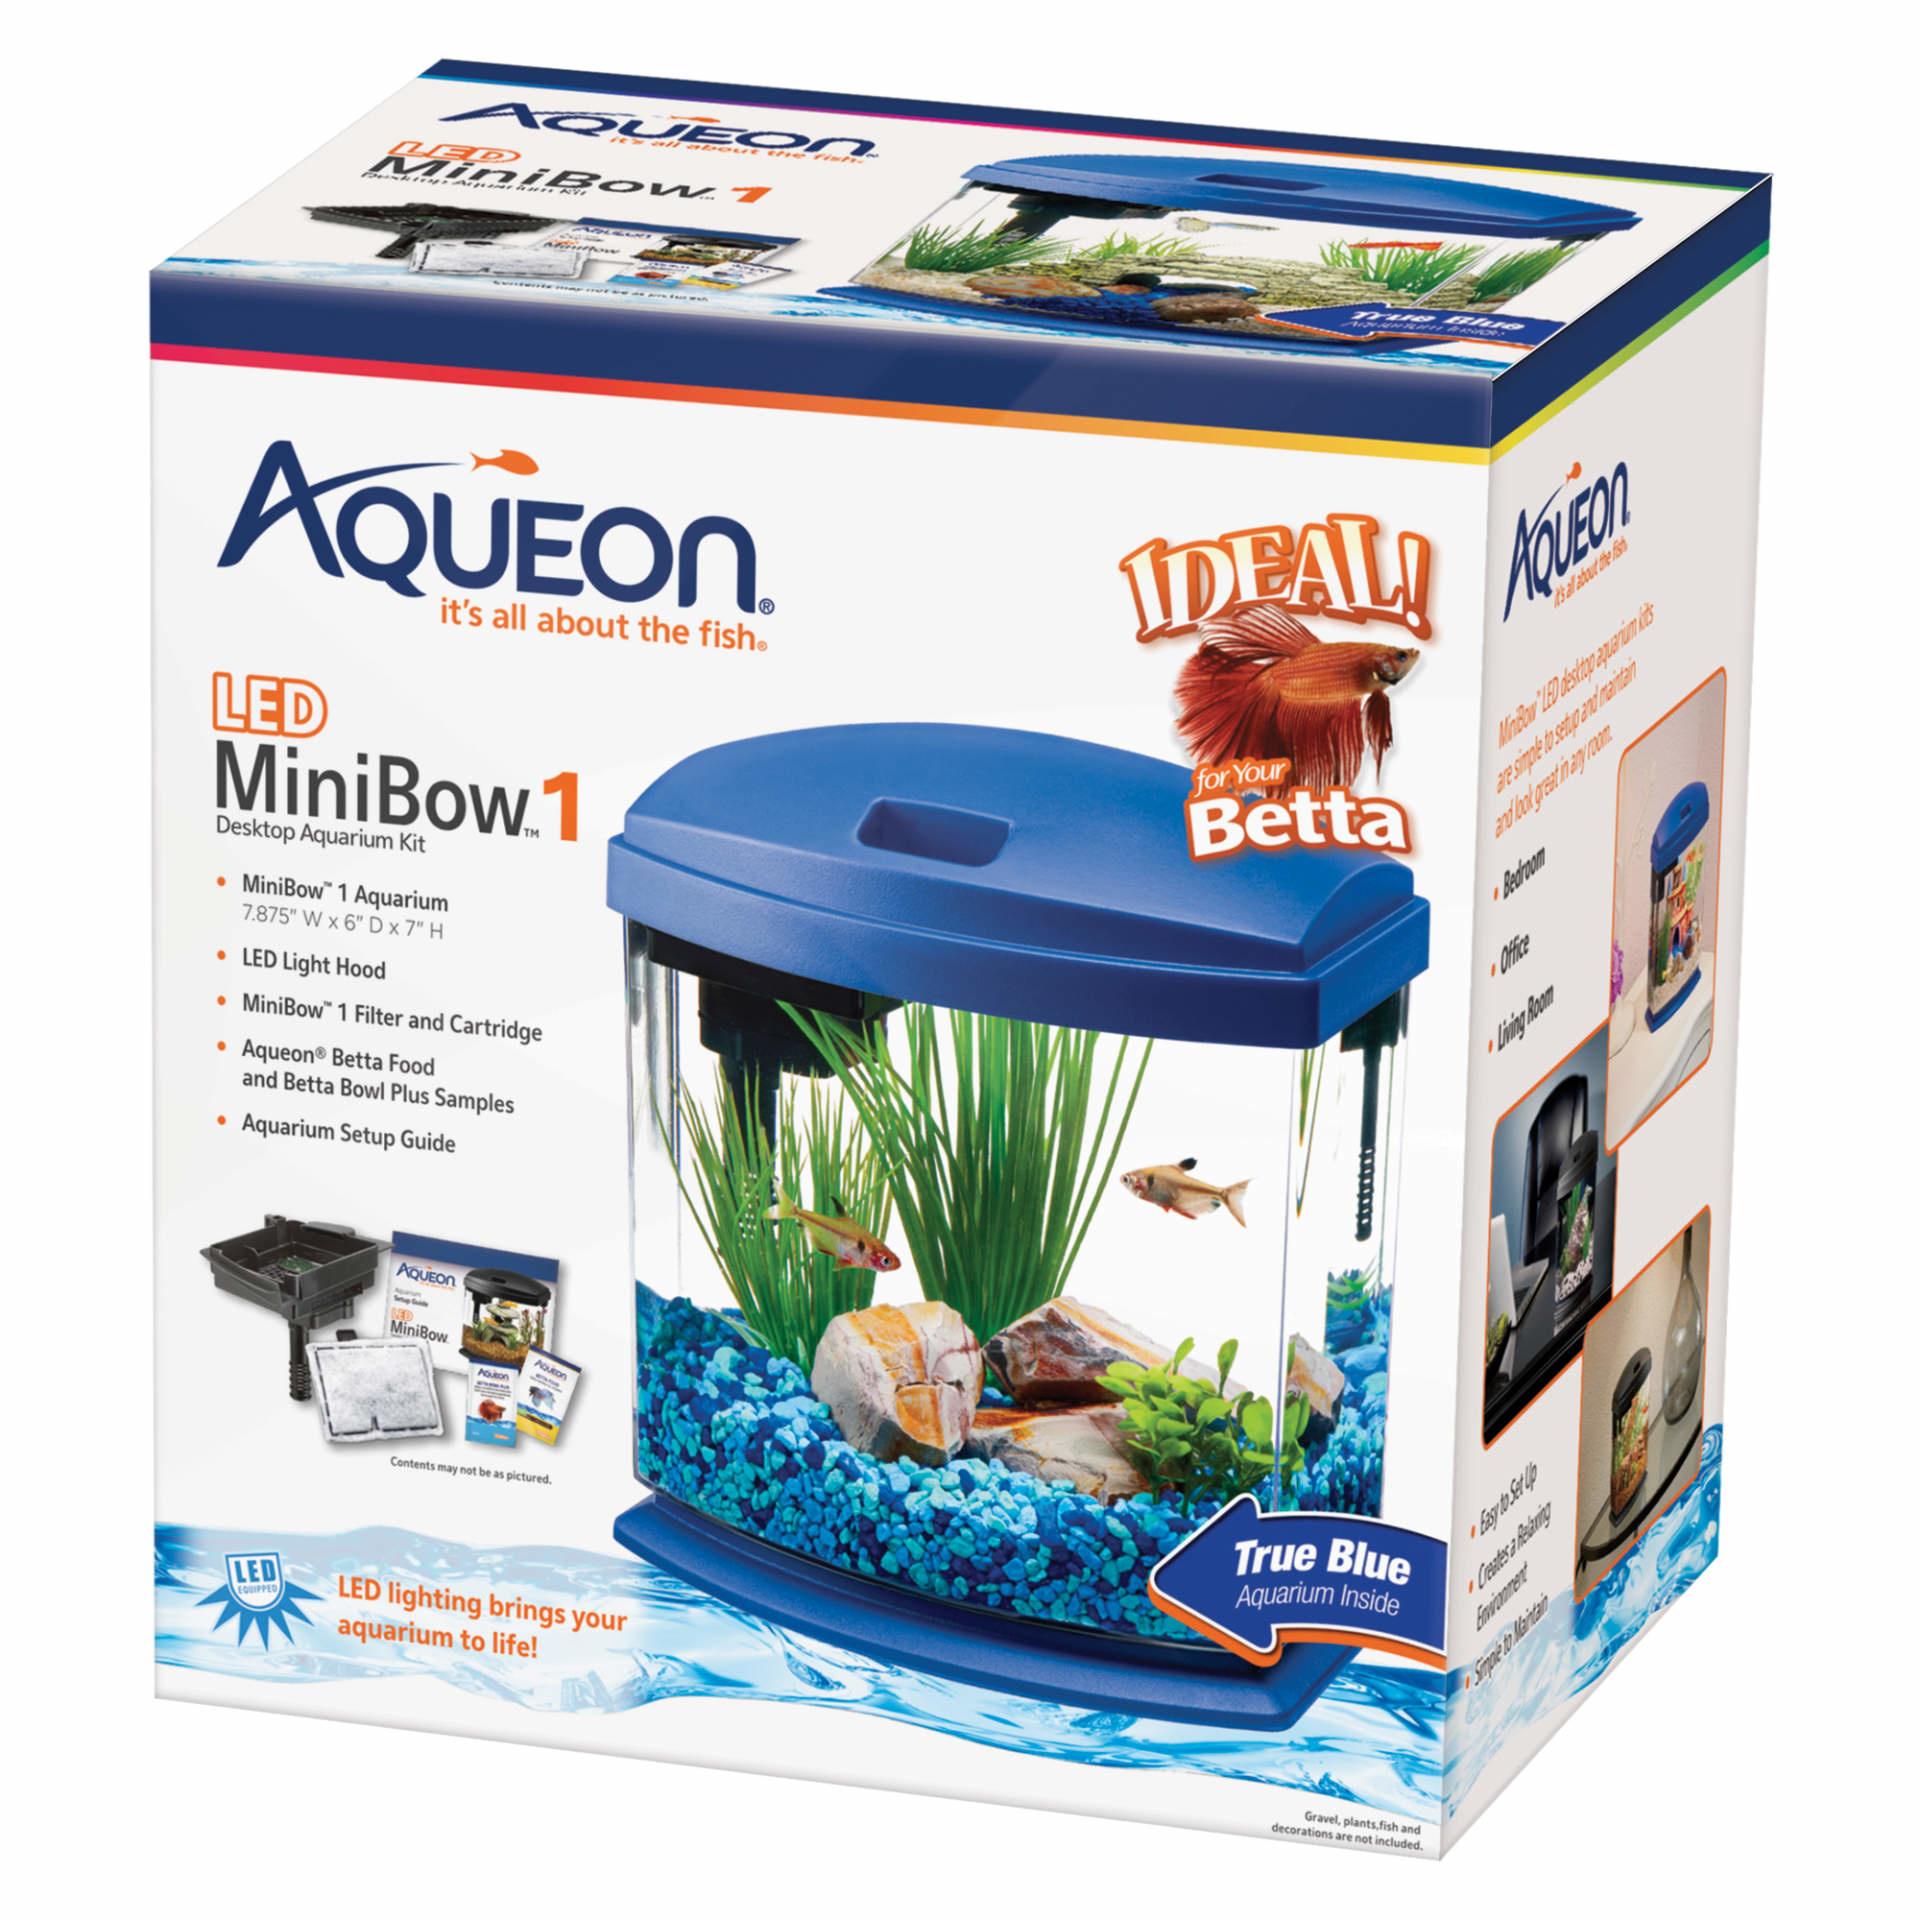 Aqueon Mini Bow 1 Led kit